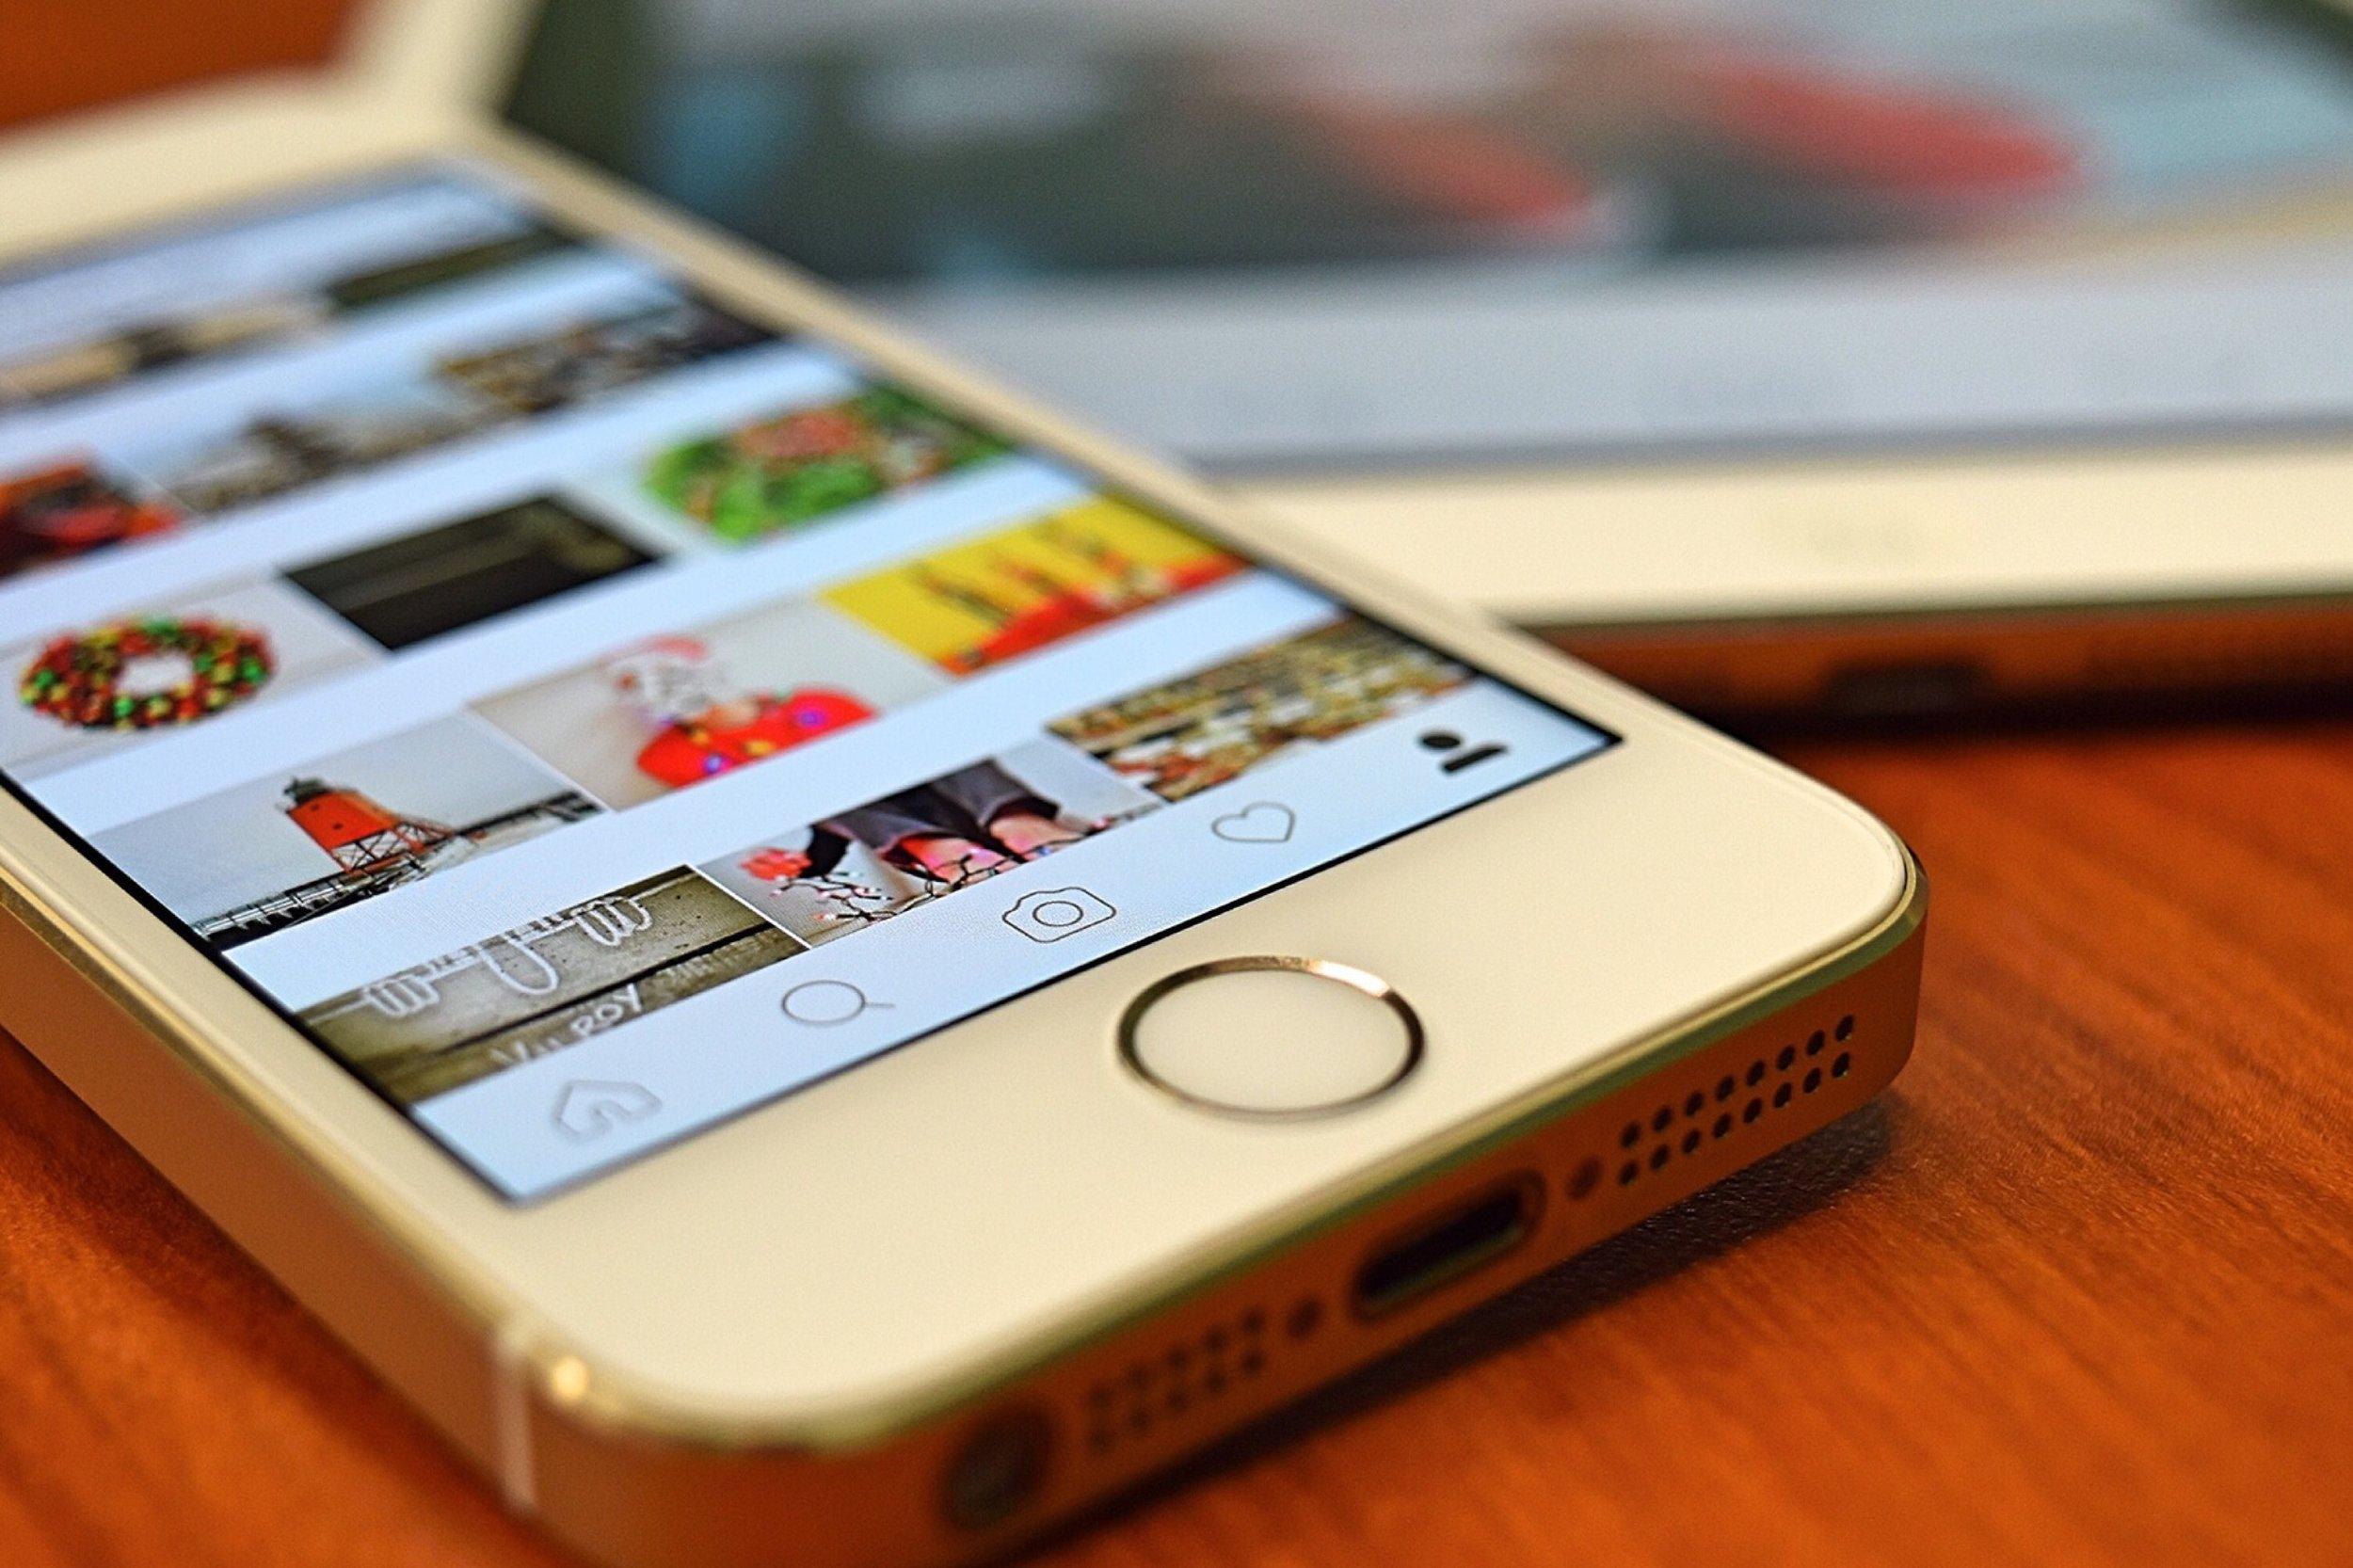 apple-devices-electronics-163184.jpg